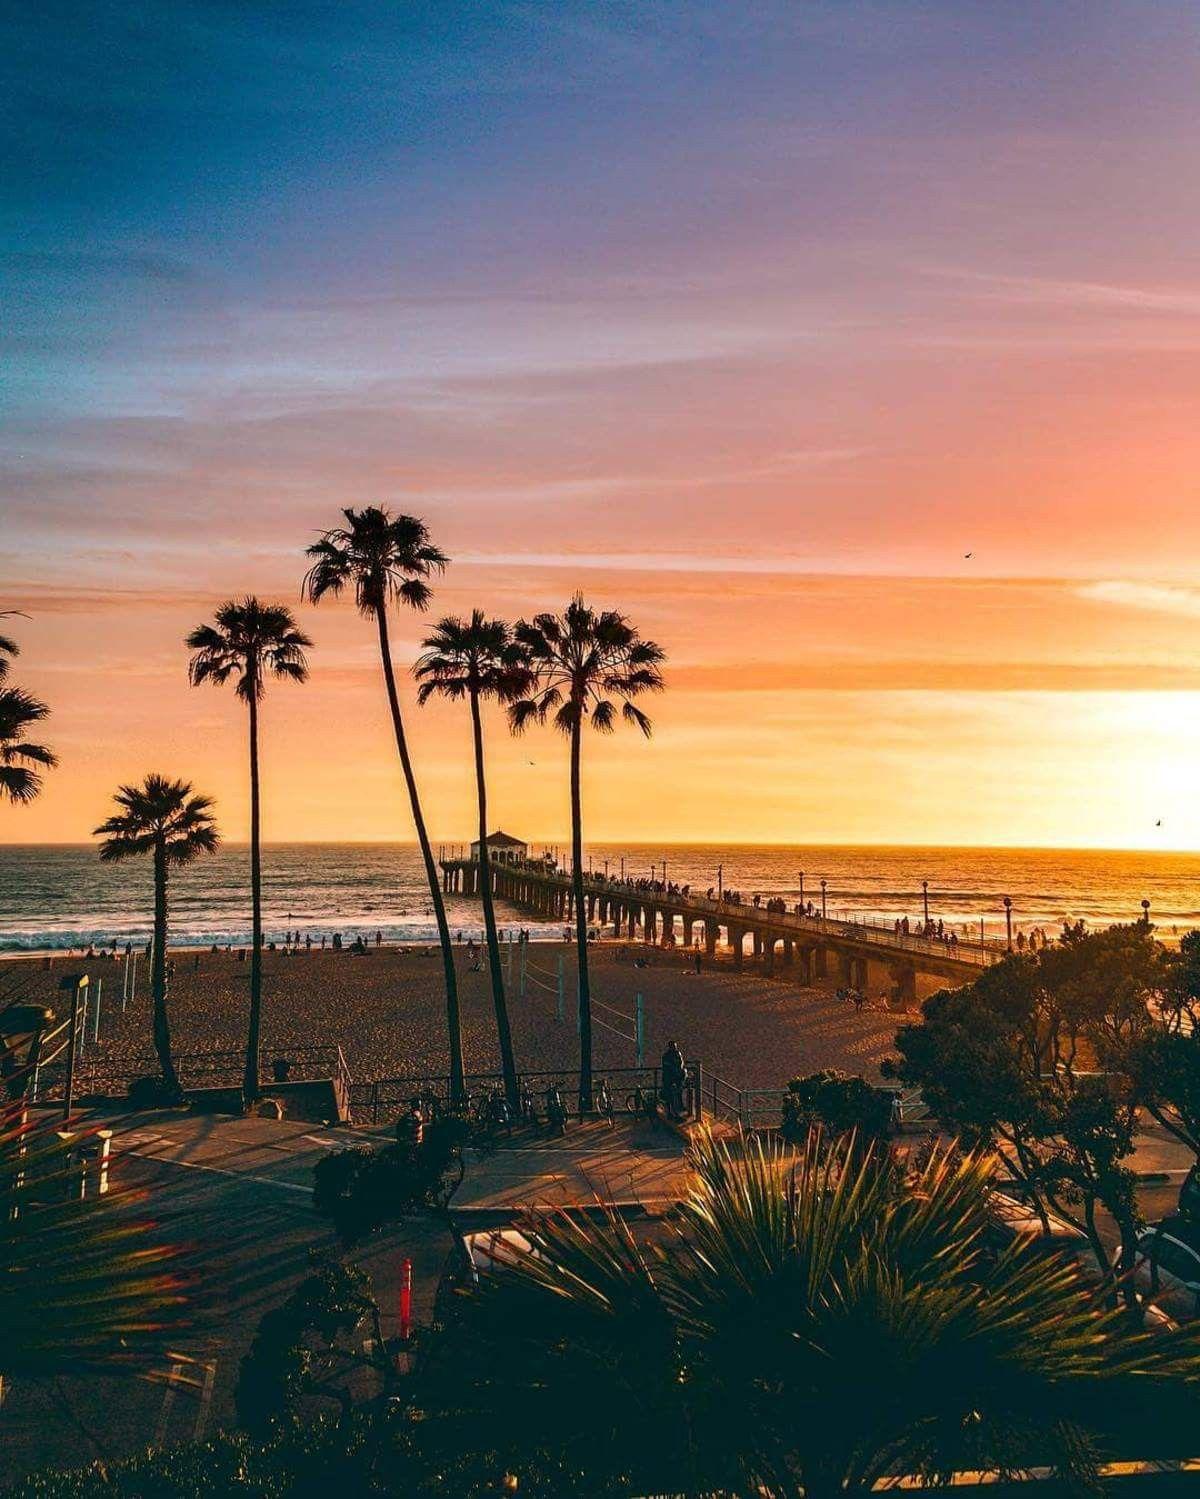 решили лос анджелес фото пляж сразу насторожил тот